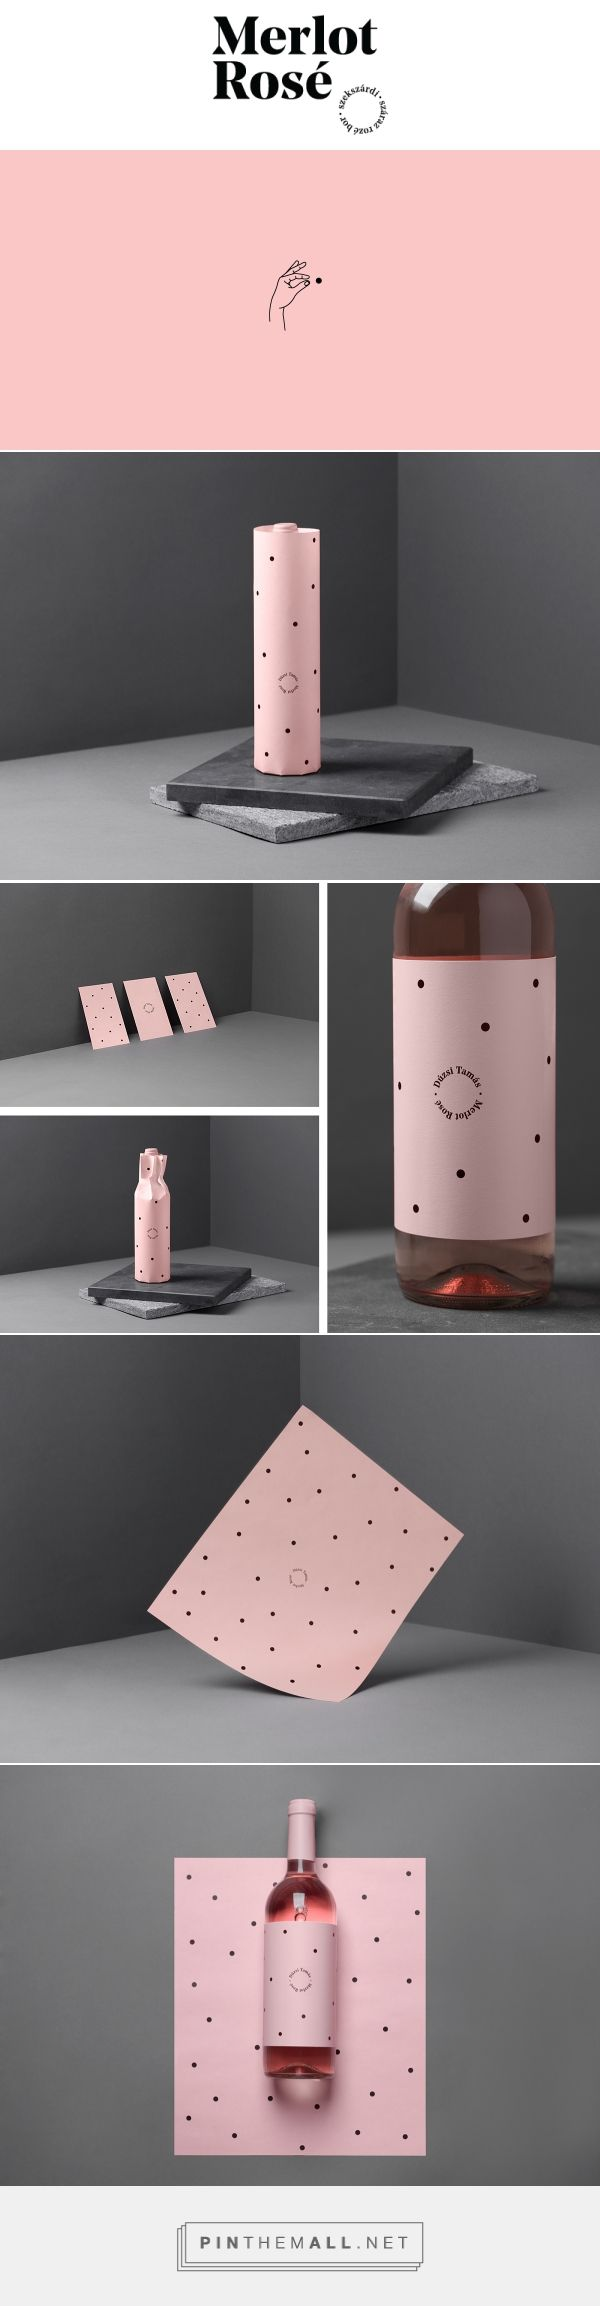 Duzsi Tamas Merlot Rose Wine Packaging by Kira Koroknai   Fivestar Branding Agency – Design and Branding Agency & Curated Inspiration Gallery